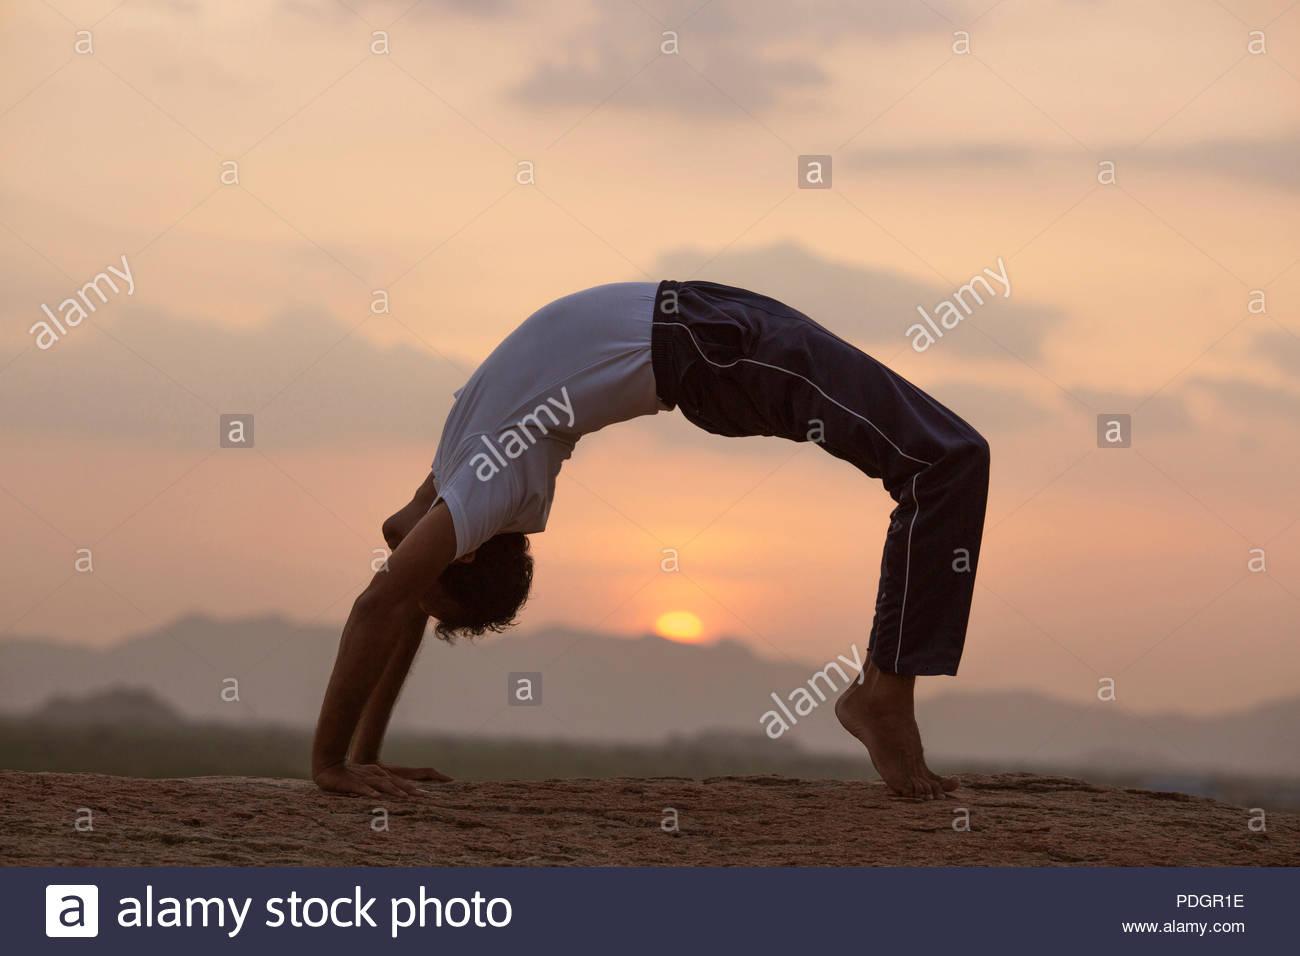 Young Indian man on top of mountain in Urdhva Dhanurasana yoga pose. - Stock Image